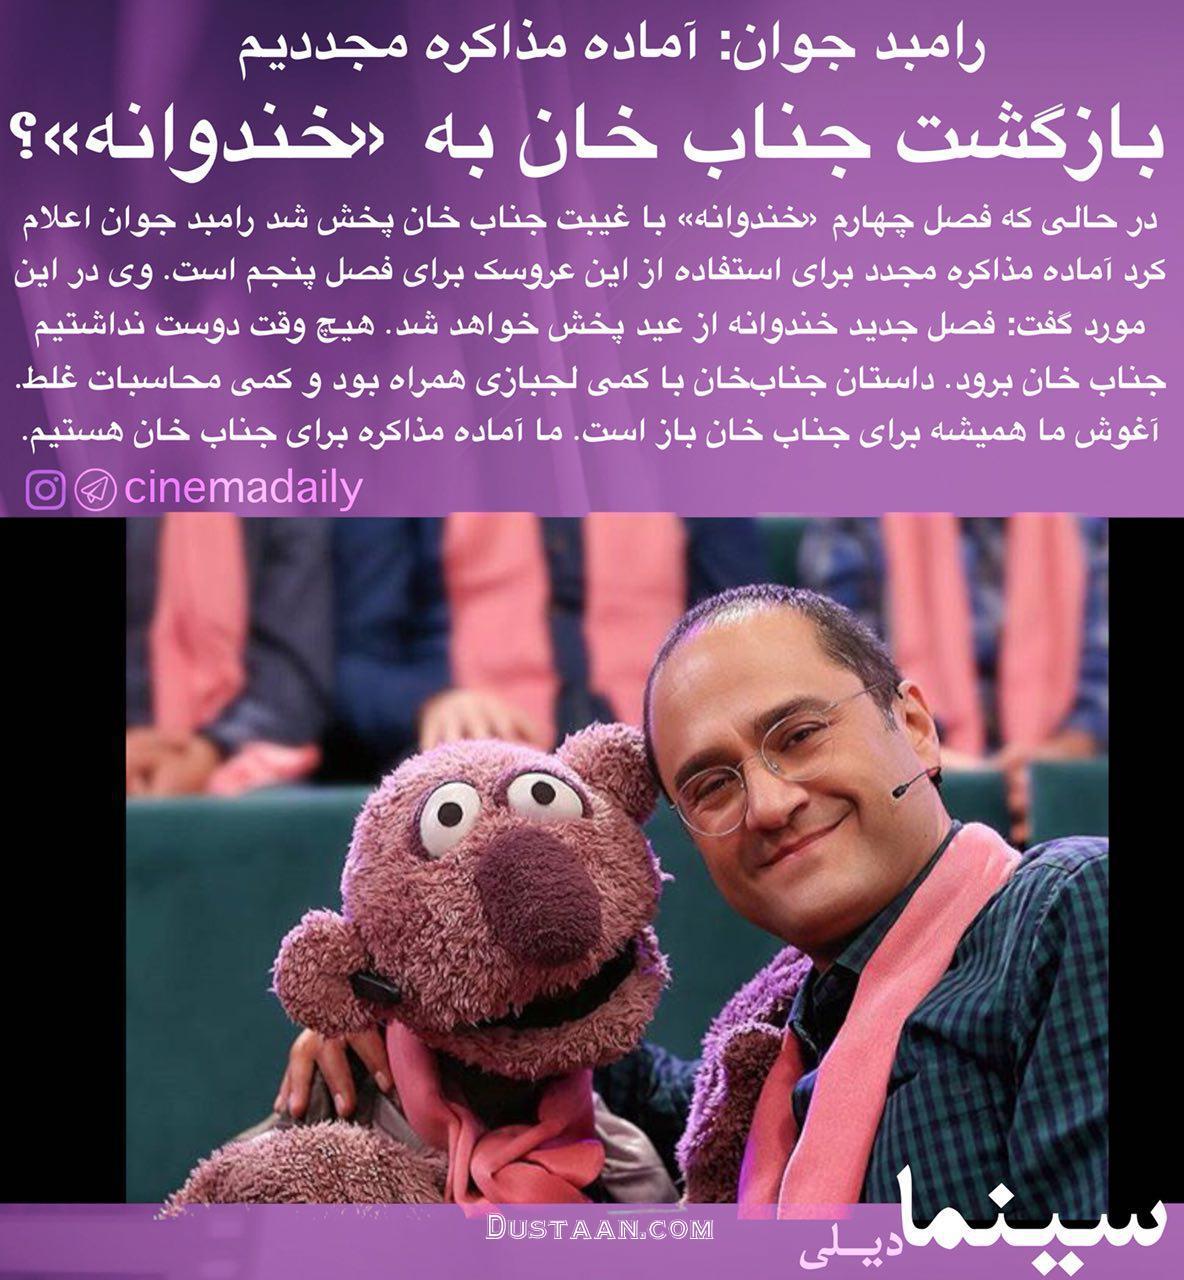 www.dustaan.com حضور جناب خان در فصل جدید خندوانه؟ +عکس